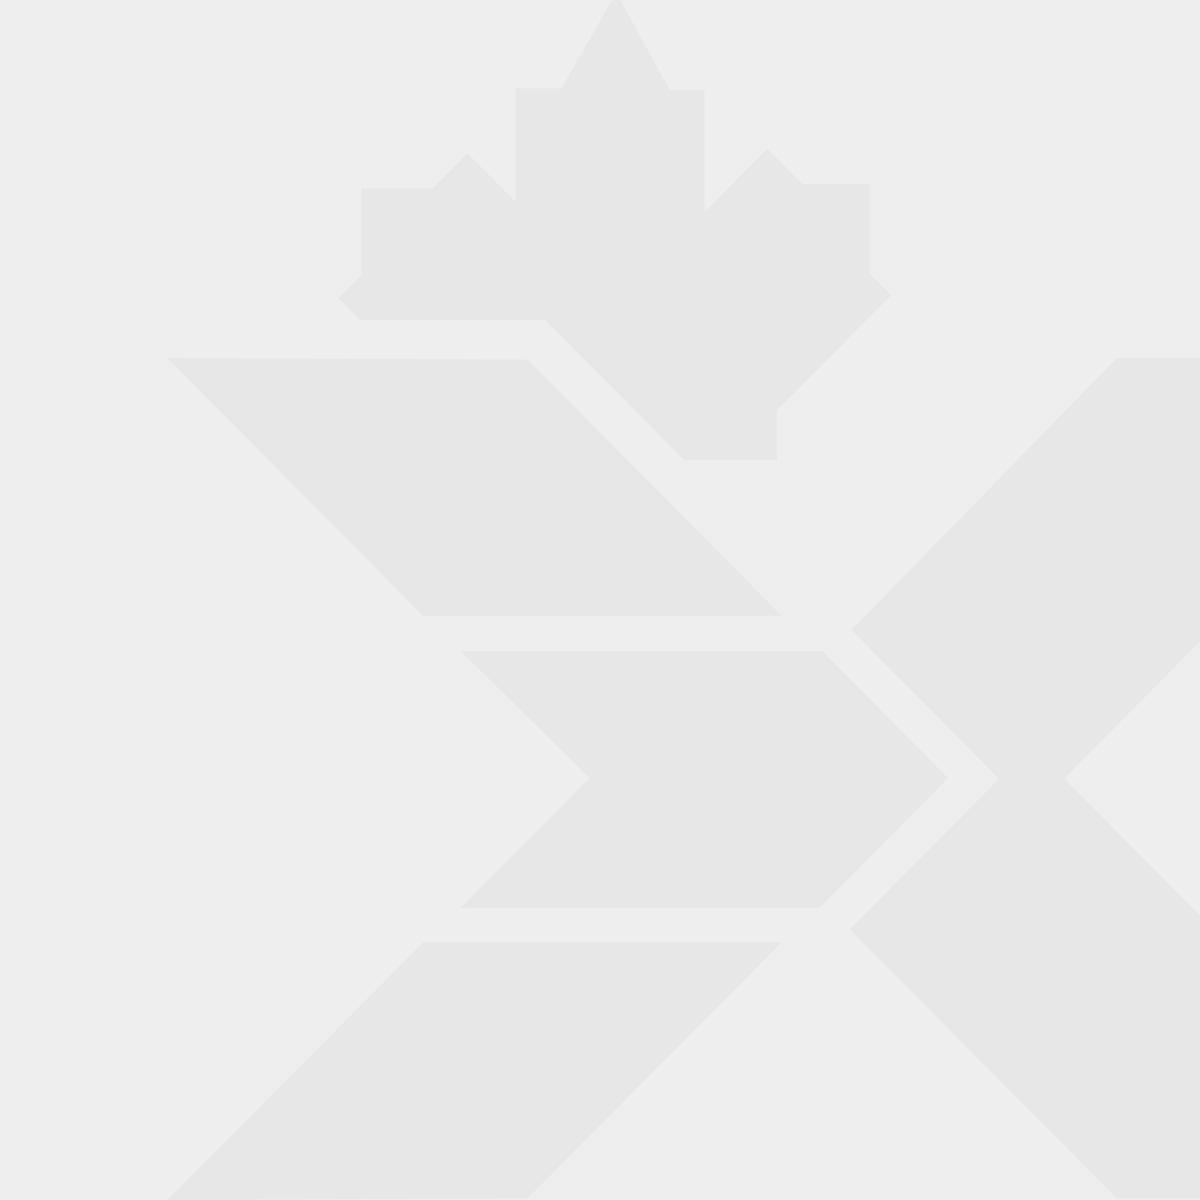 HMCS Ottawa Vacuum Tumbler